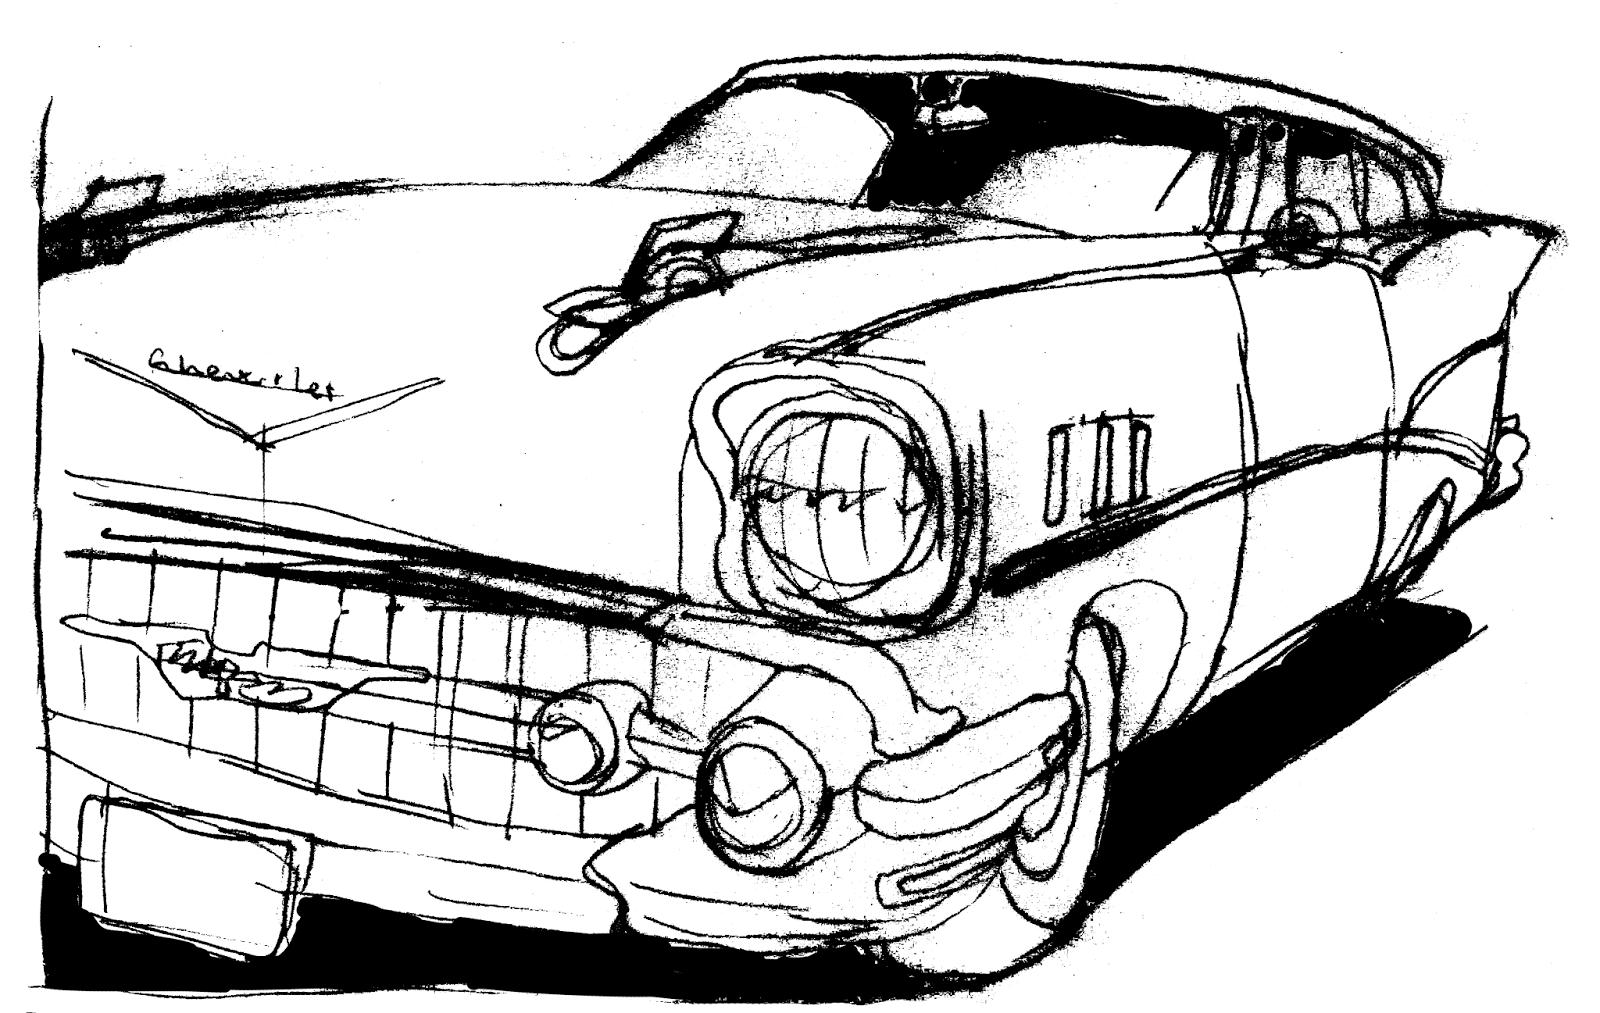 Don Moyer Sketchbook August